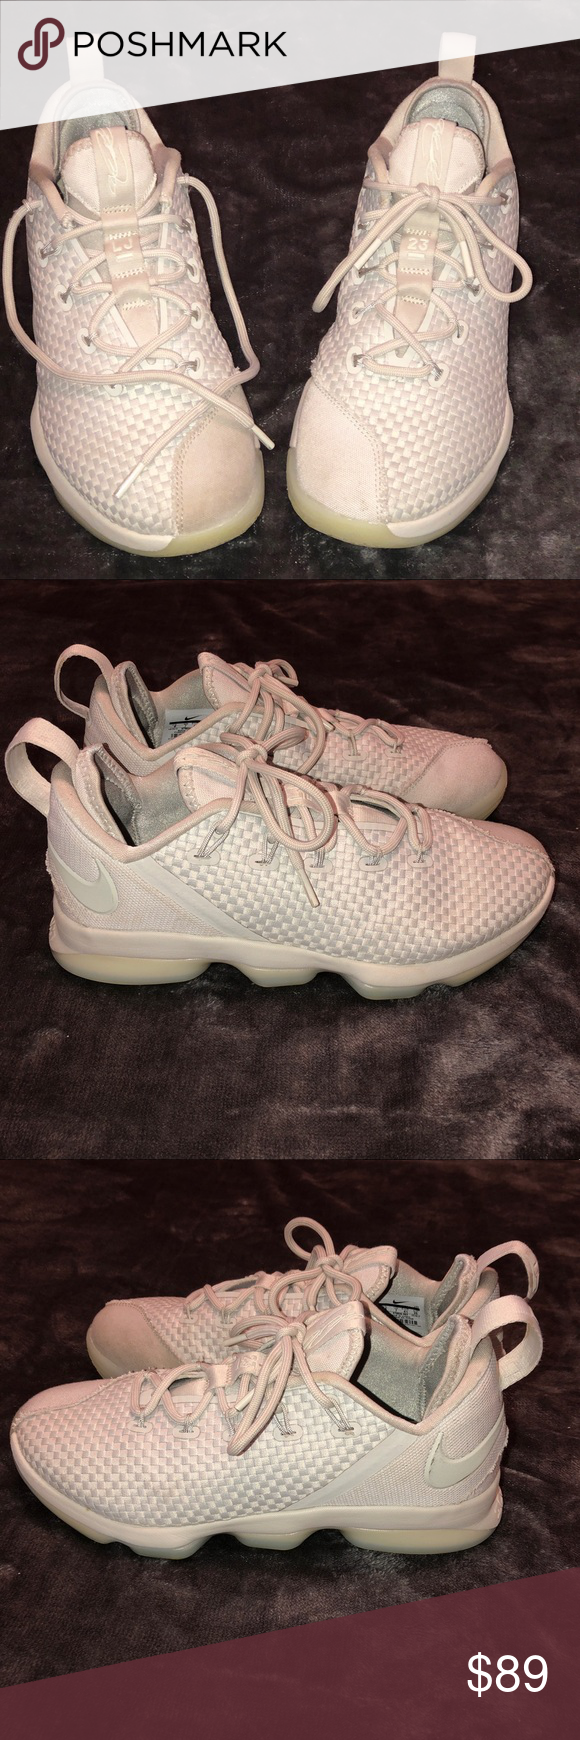 e242703dbde81 Nike LeBron James 14 low top light bone ivory sz 8 Nike LeBron James ...